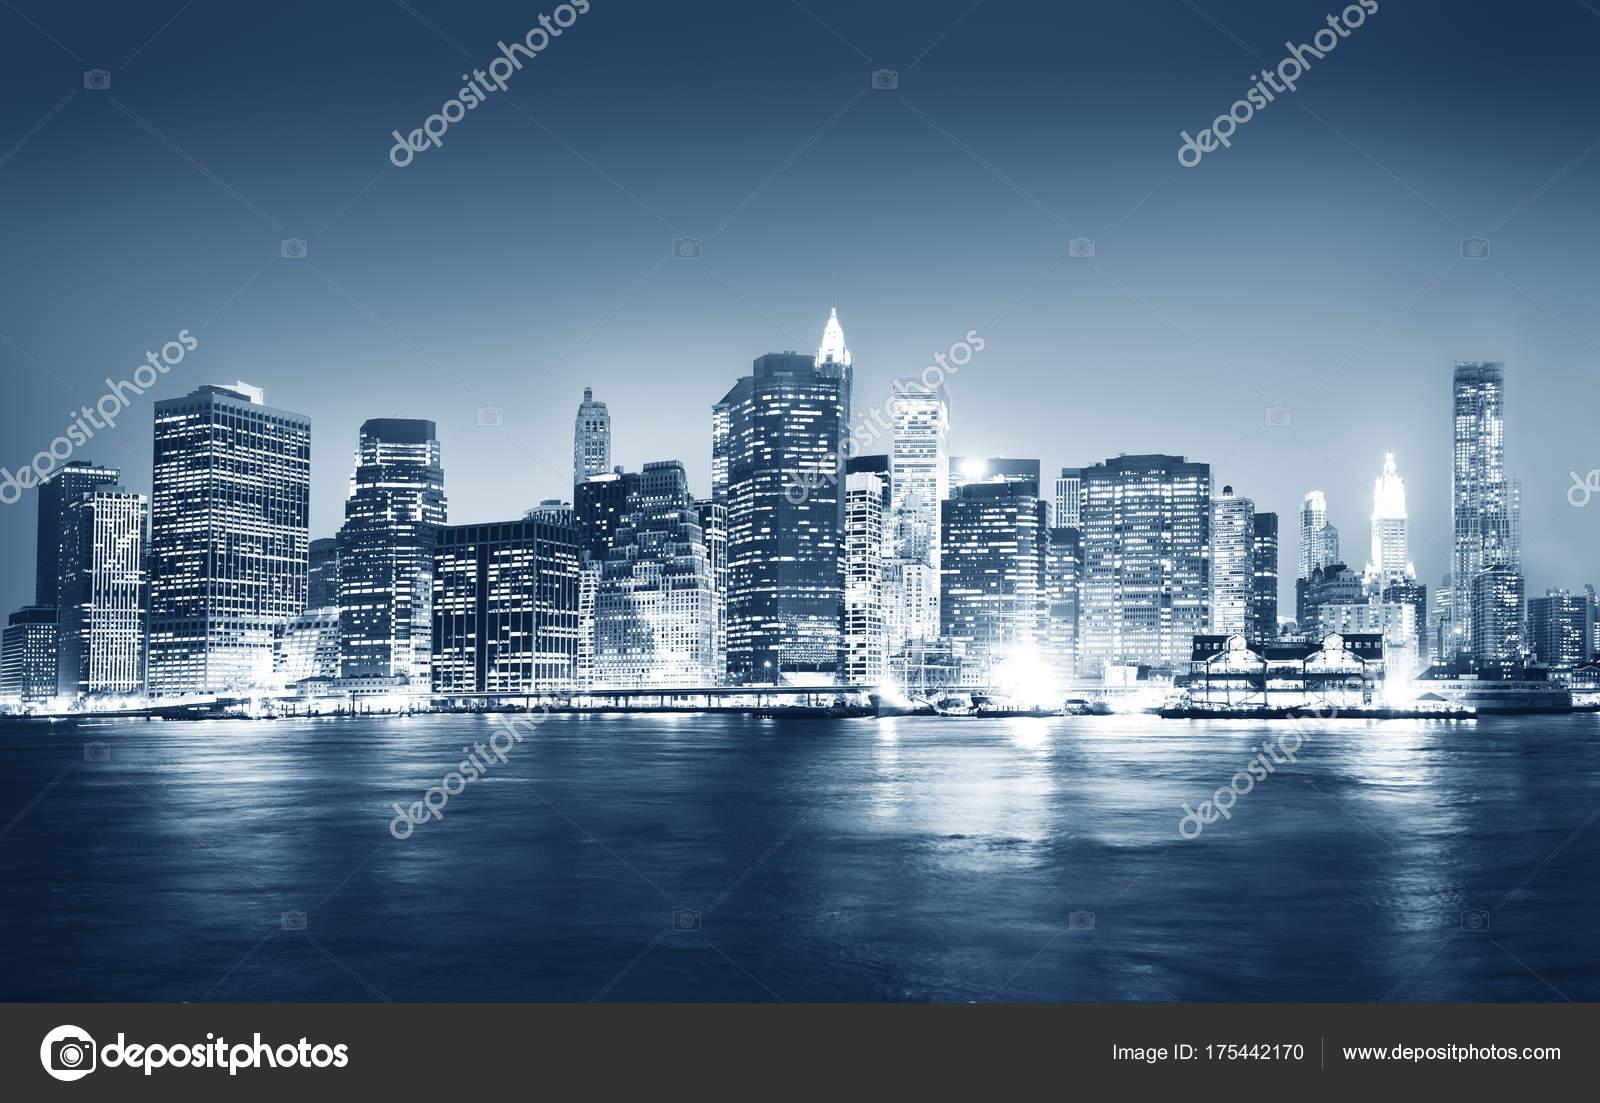 View New York City Night Time Original Photoset Stock Photo C Rawpixel 175442170